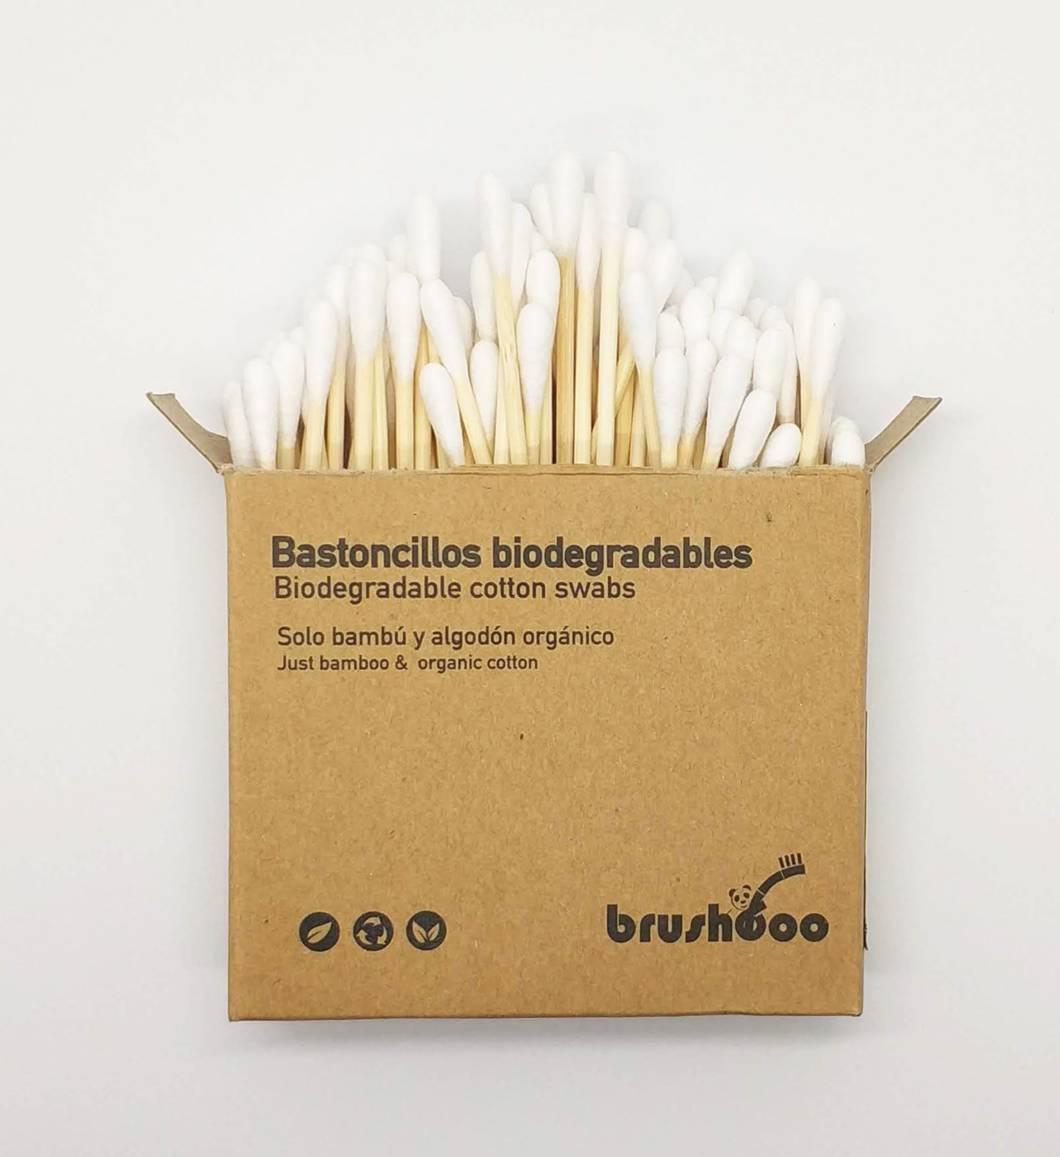 Bastoncillos biodegradables de bambú – Brushboo